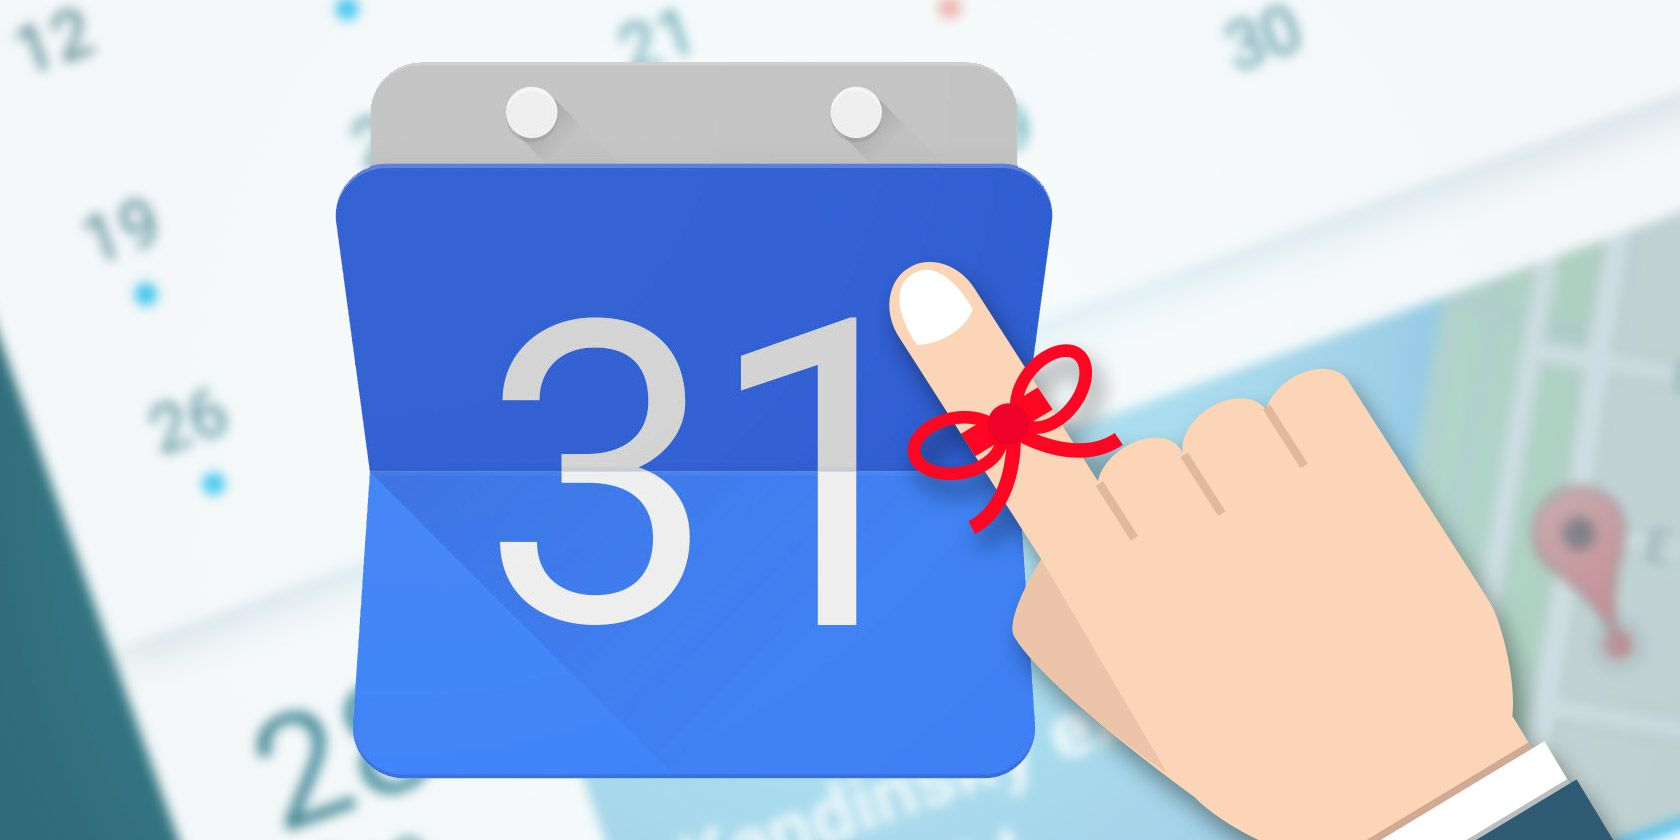 Reminders Make Google Calendar an Incredible To-Do List